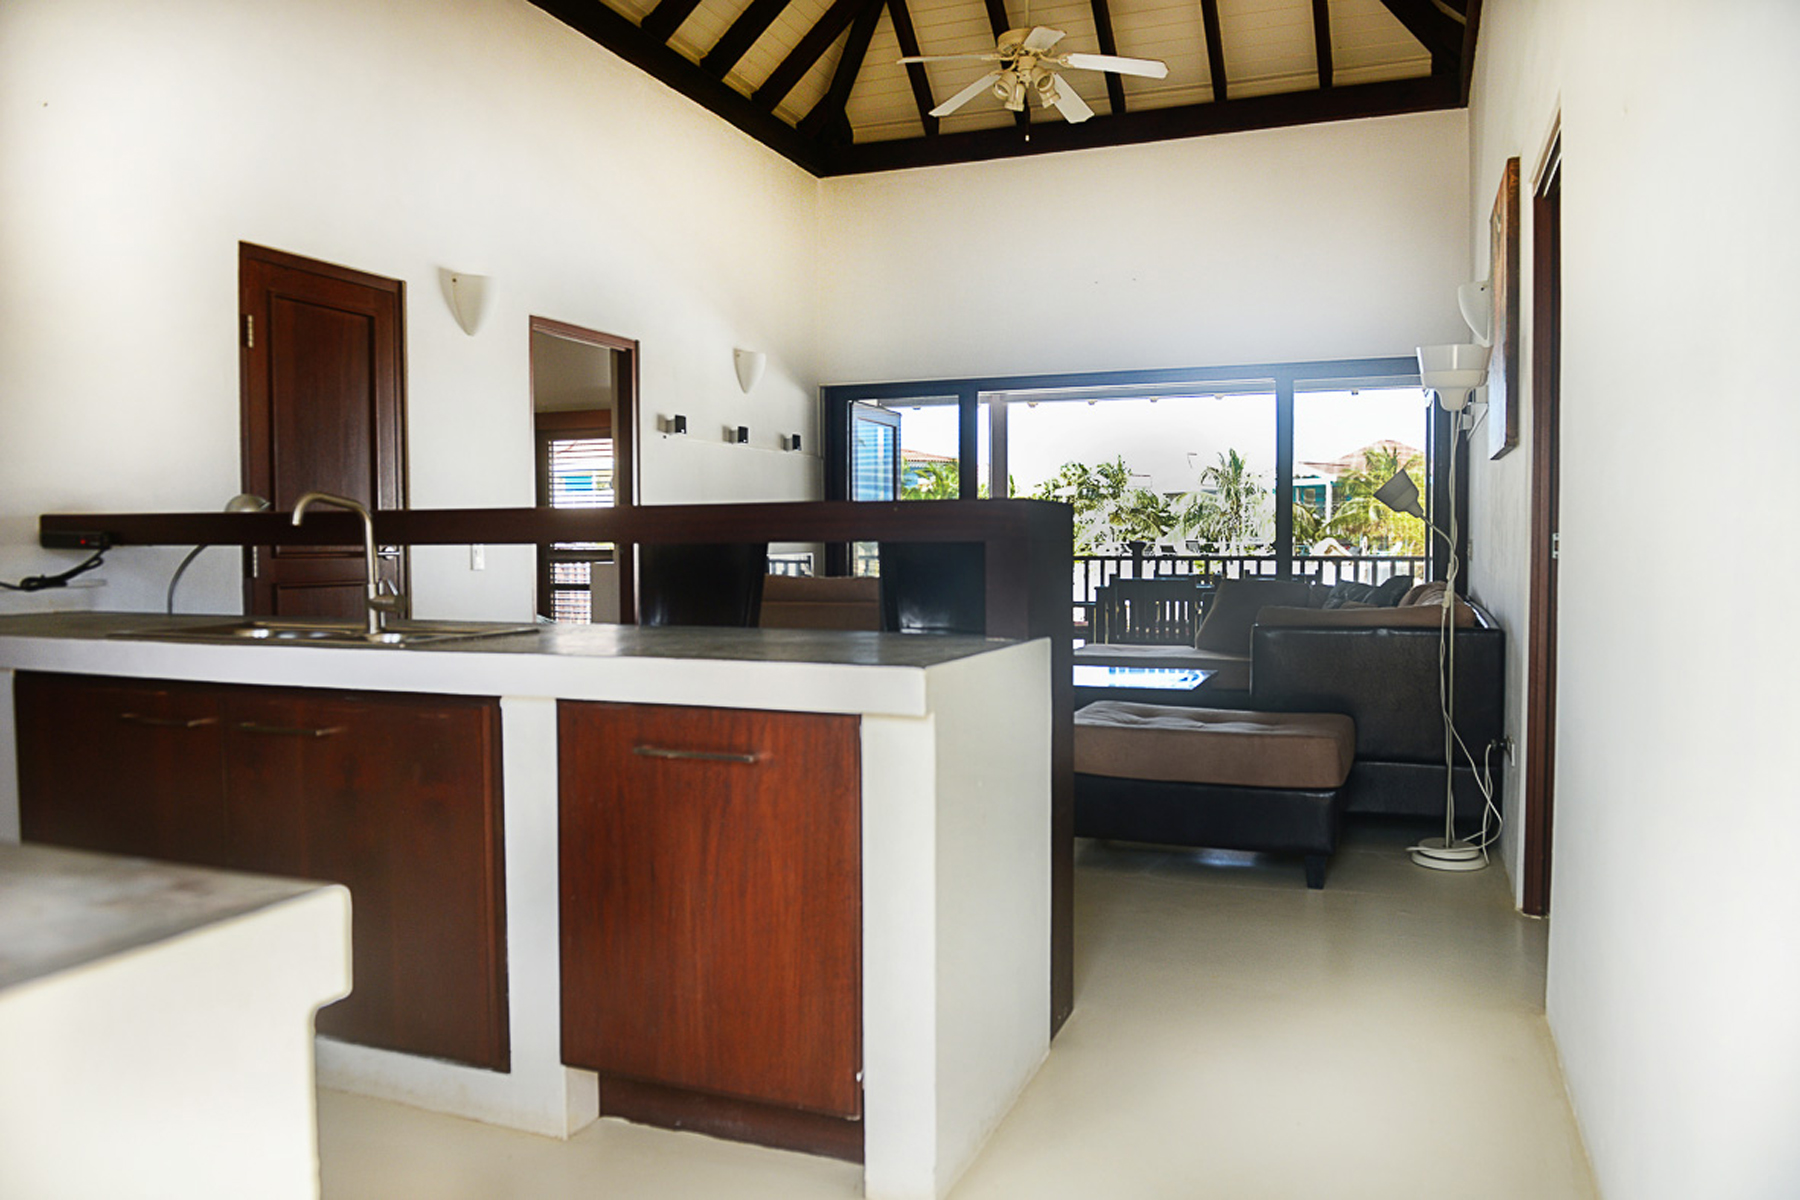 Additional photo for property listing at Waterlands Village Cottages Kralendijk, Bonaire Bonaire